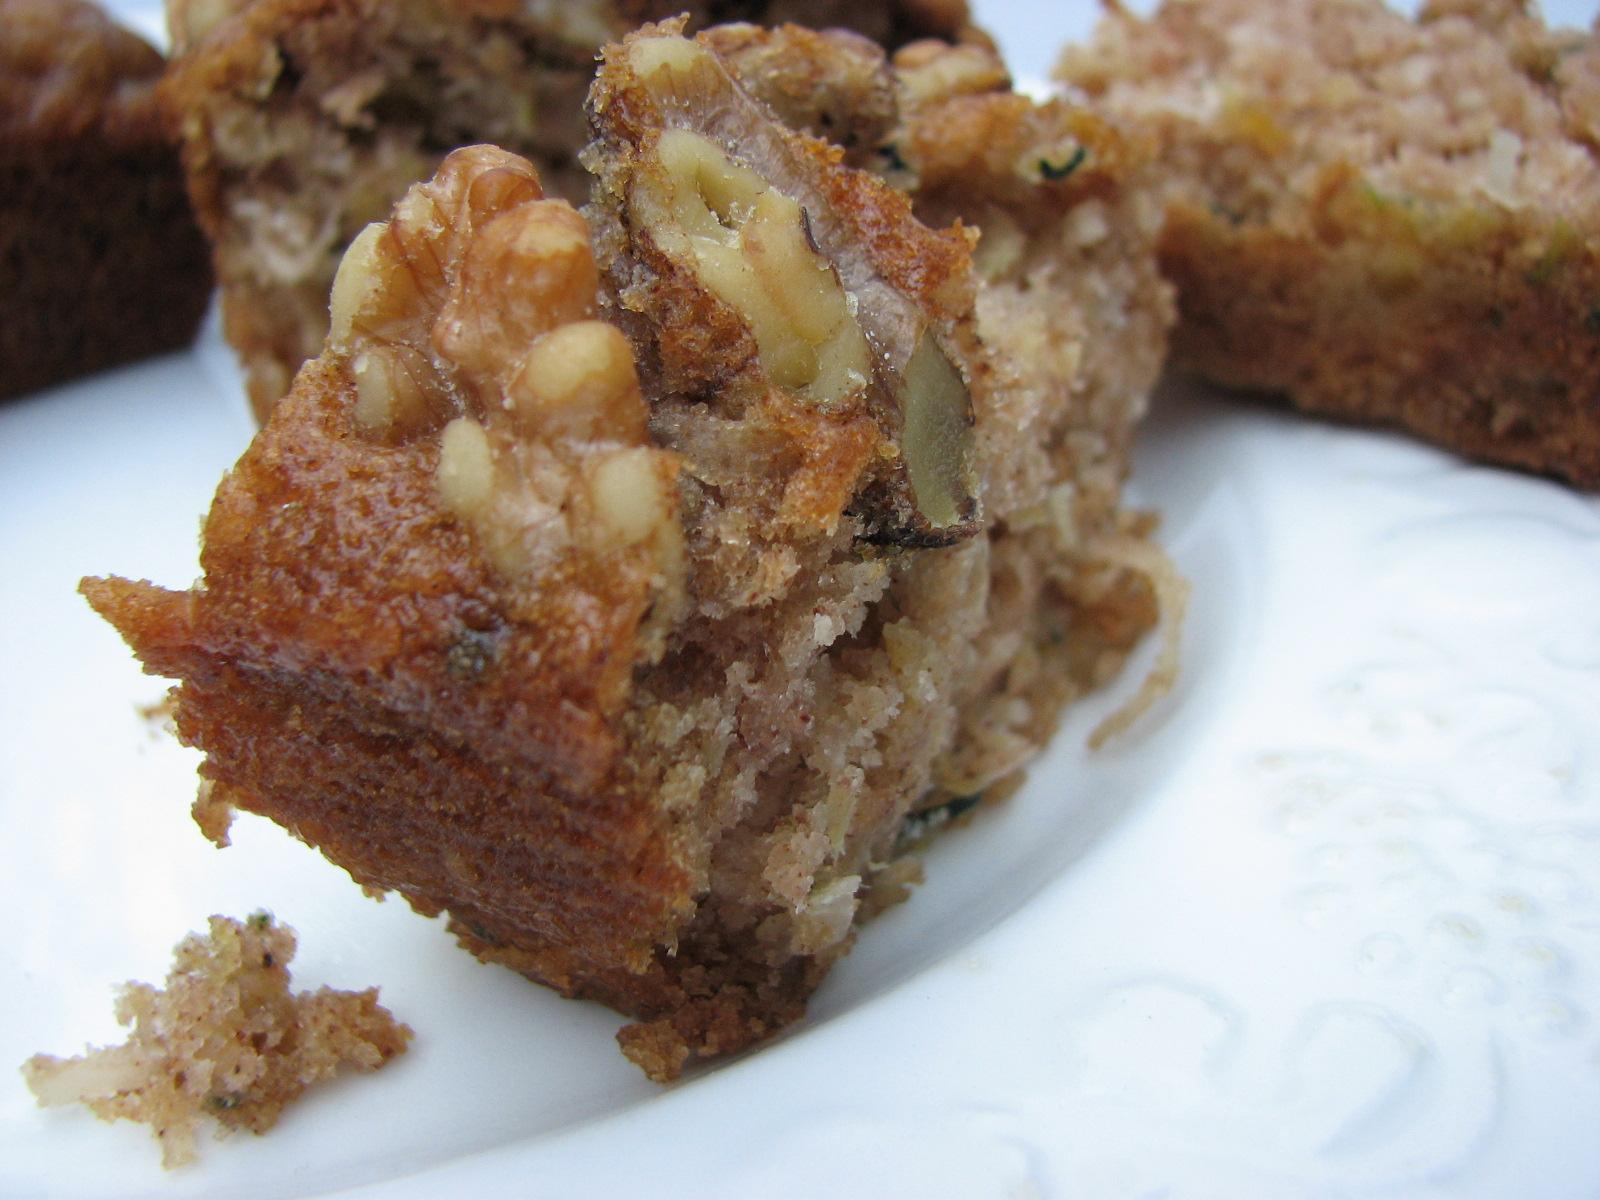 Heidi Bakes: Pineapple coconut zucchini walnut bread